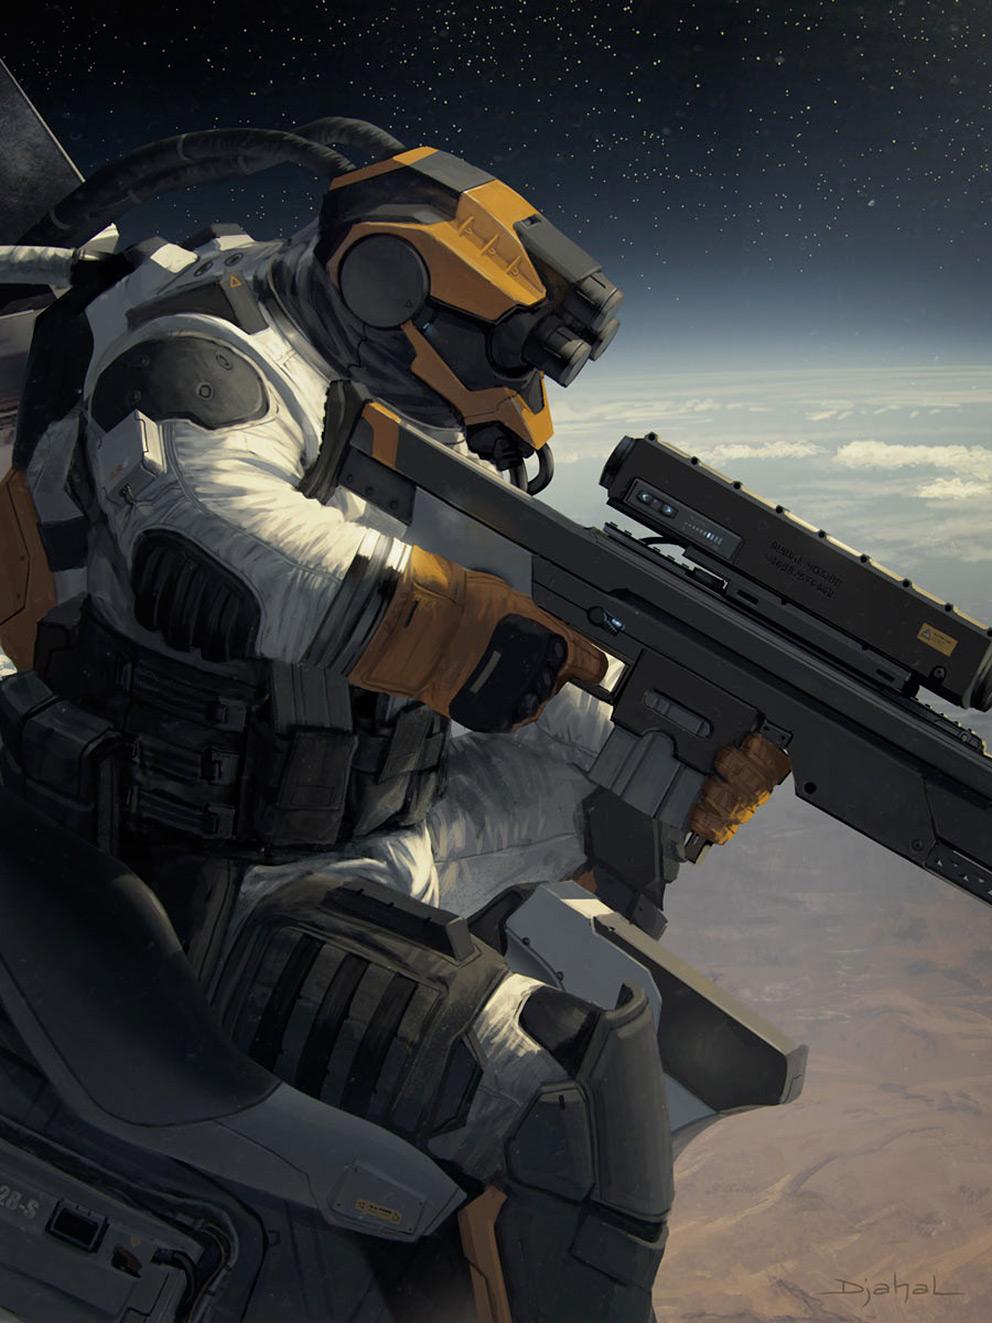 Sci-fi-Art-Geoffroy-Thoorens-Orbital-Sniper.jpg